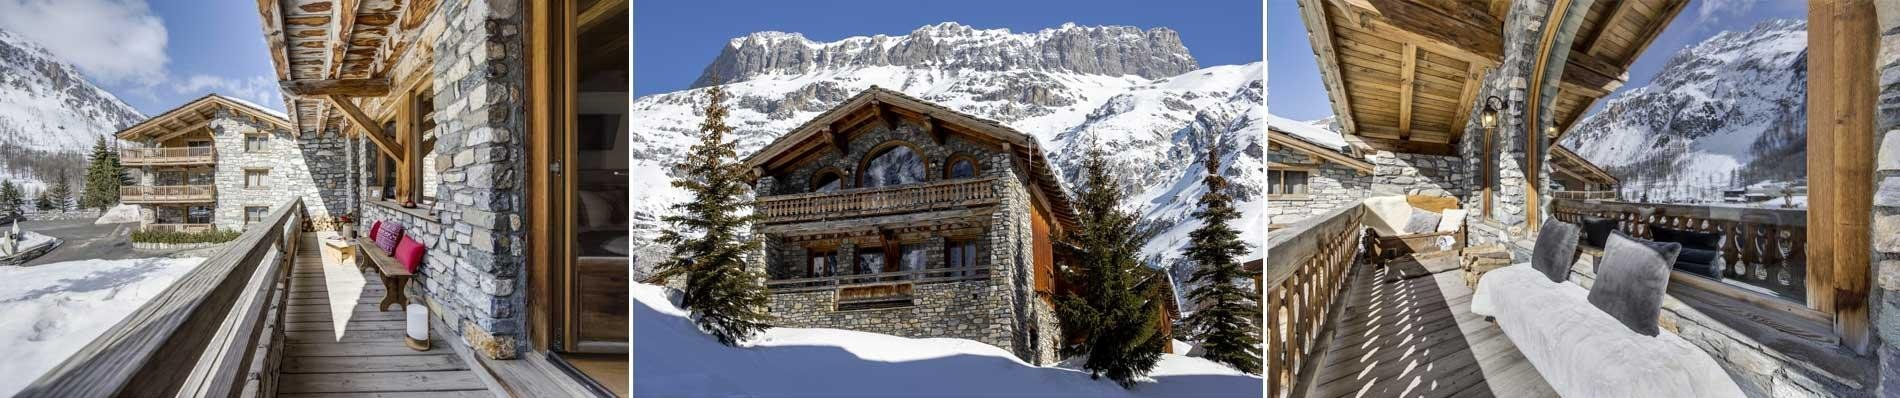 CHALET-LUXE LA BOUCLIA val d isere wintersport ski